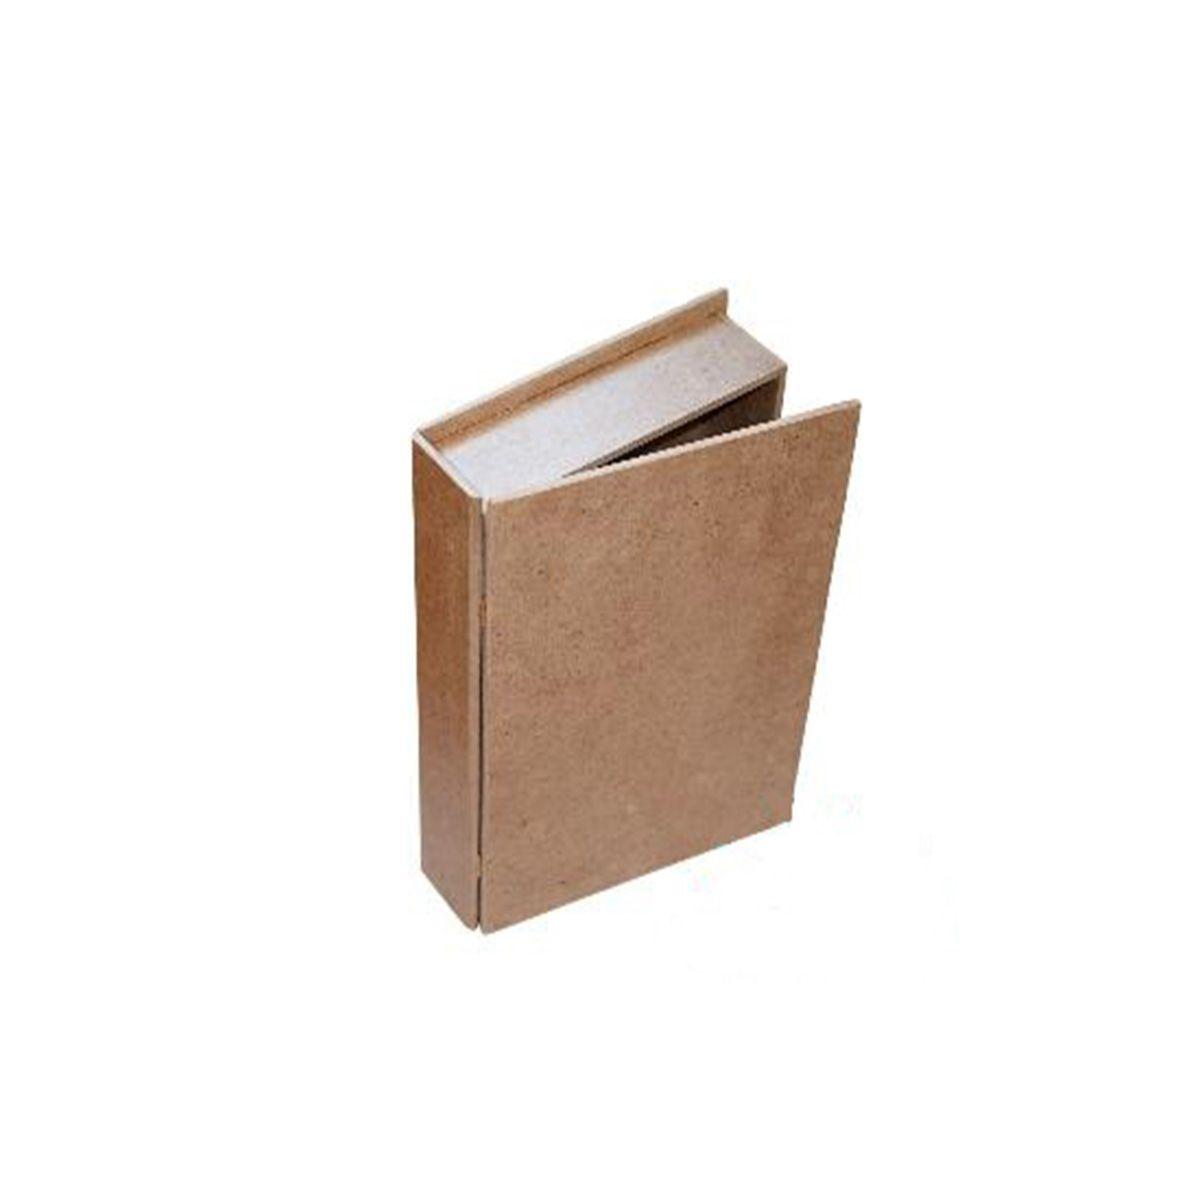 AH6140145 Заготовка из МДФ 'Шкатулка-книга большая', 34х24х8 см